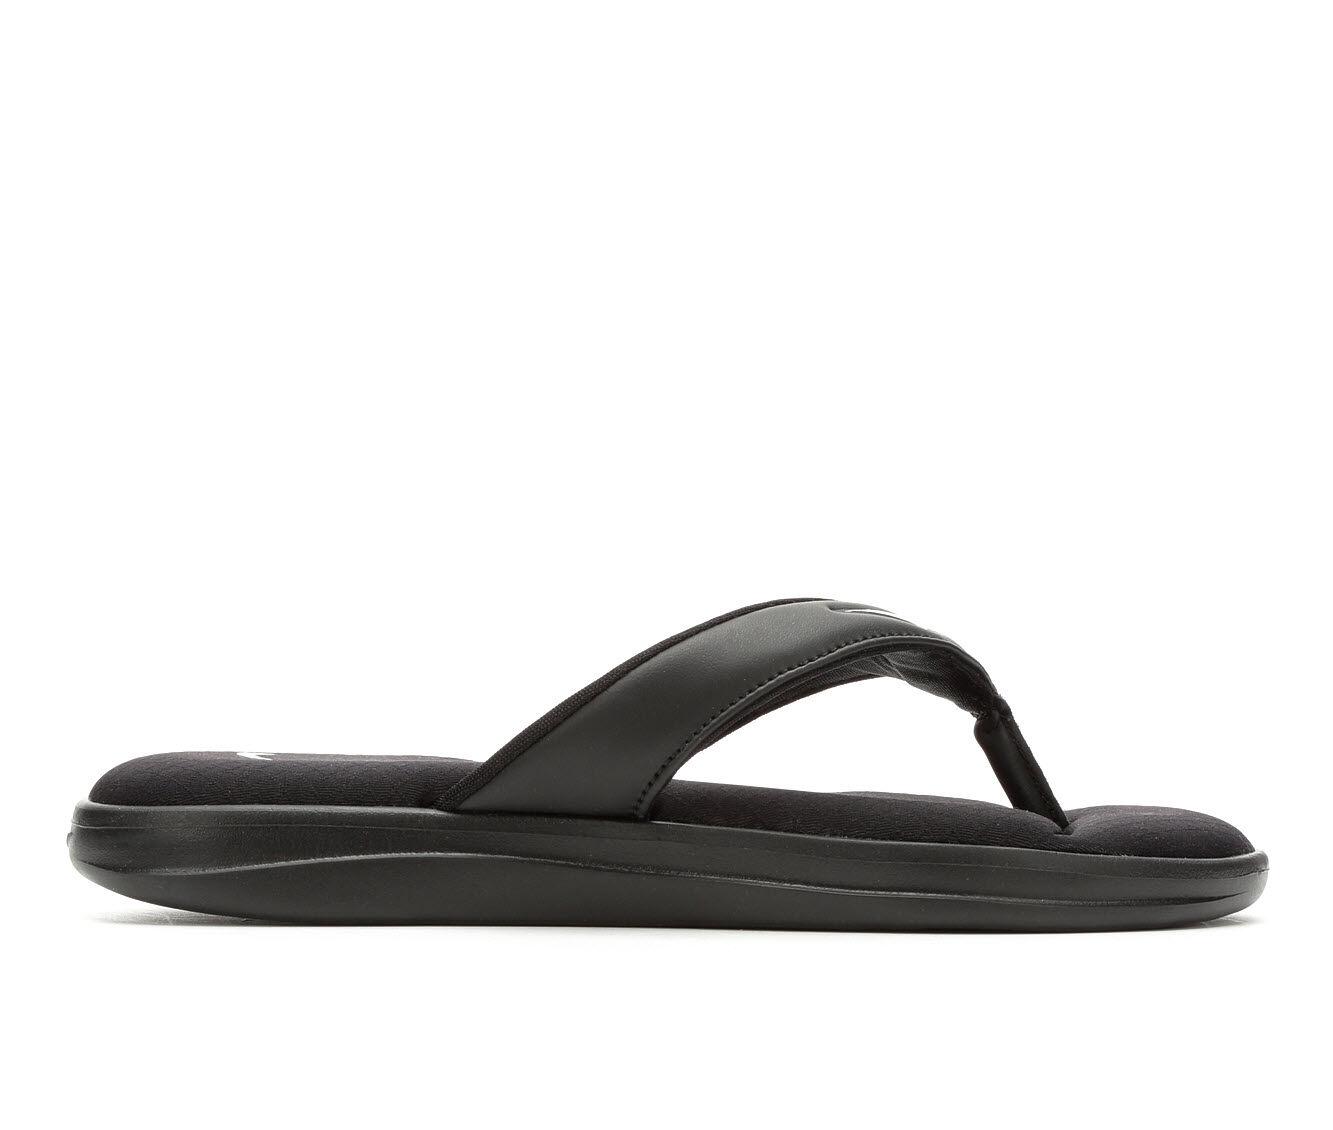 Outdoor Sports Women's Nike Ultra Comfort Thong 3 Sport Sandals Black/White